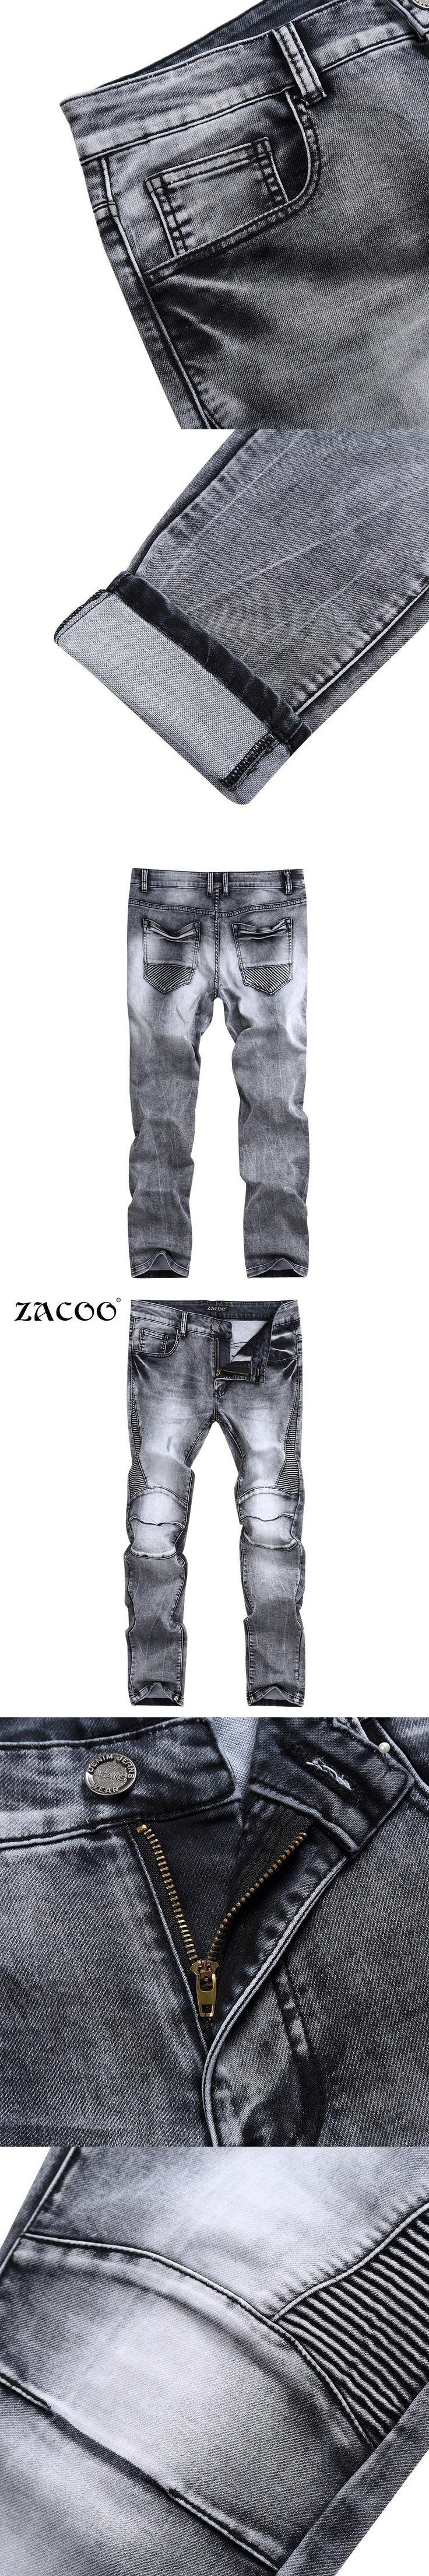 ZACOO Brand Jeans Men Back Pocket Fashion Brand Pants Jeans Male Casual Straight jeans Denim Cotton Grey jean mens vaqueros #mensjeansbrands